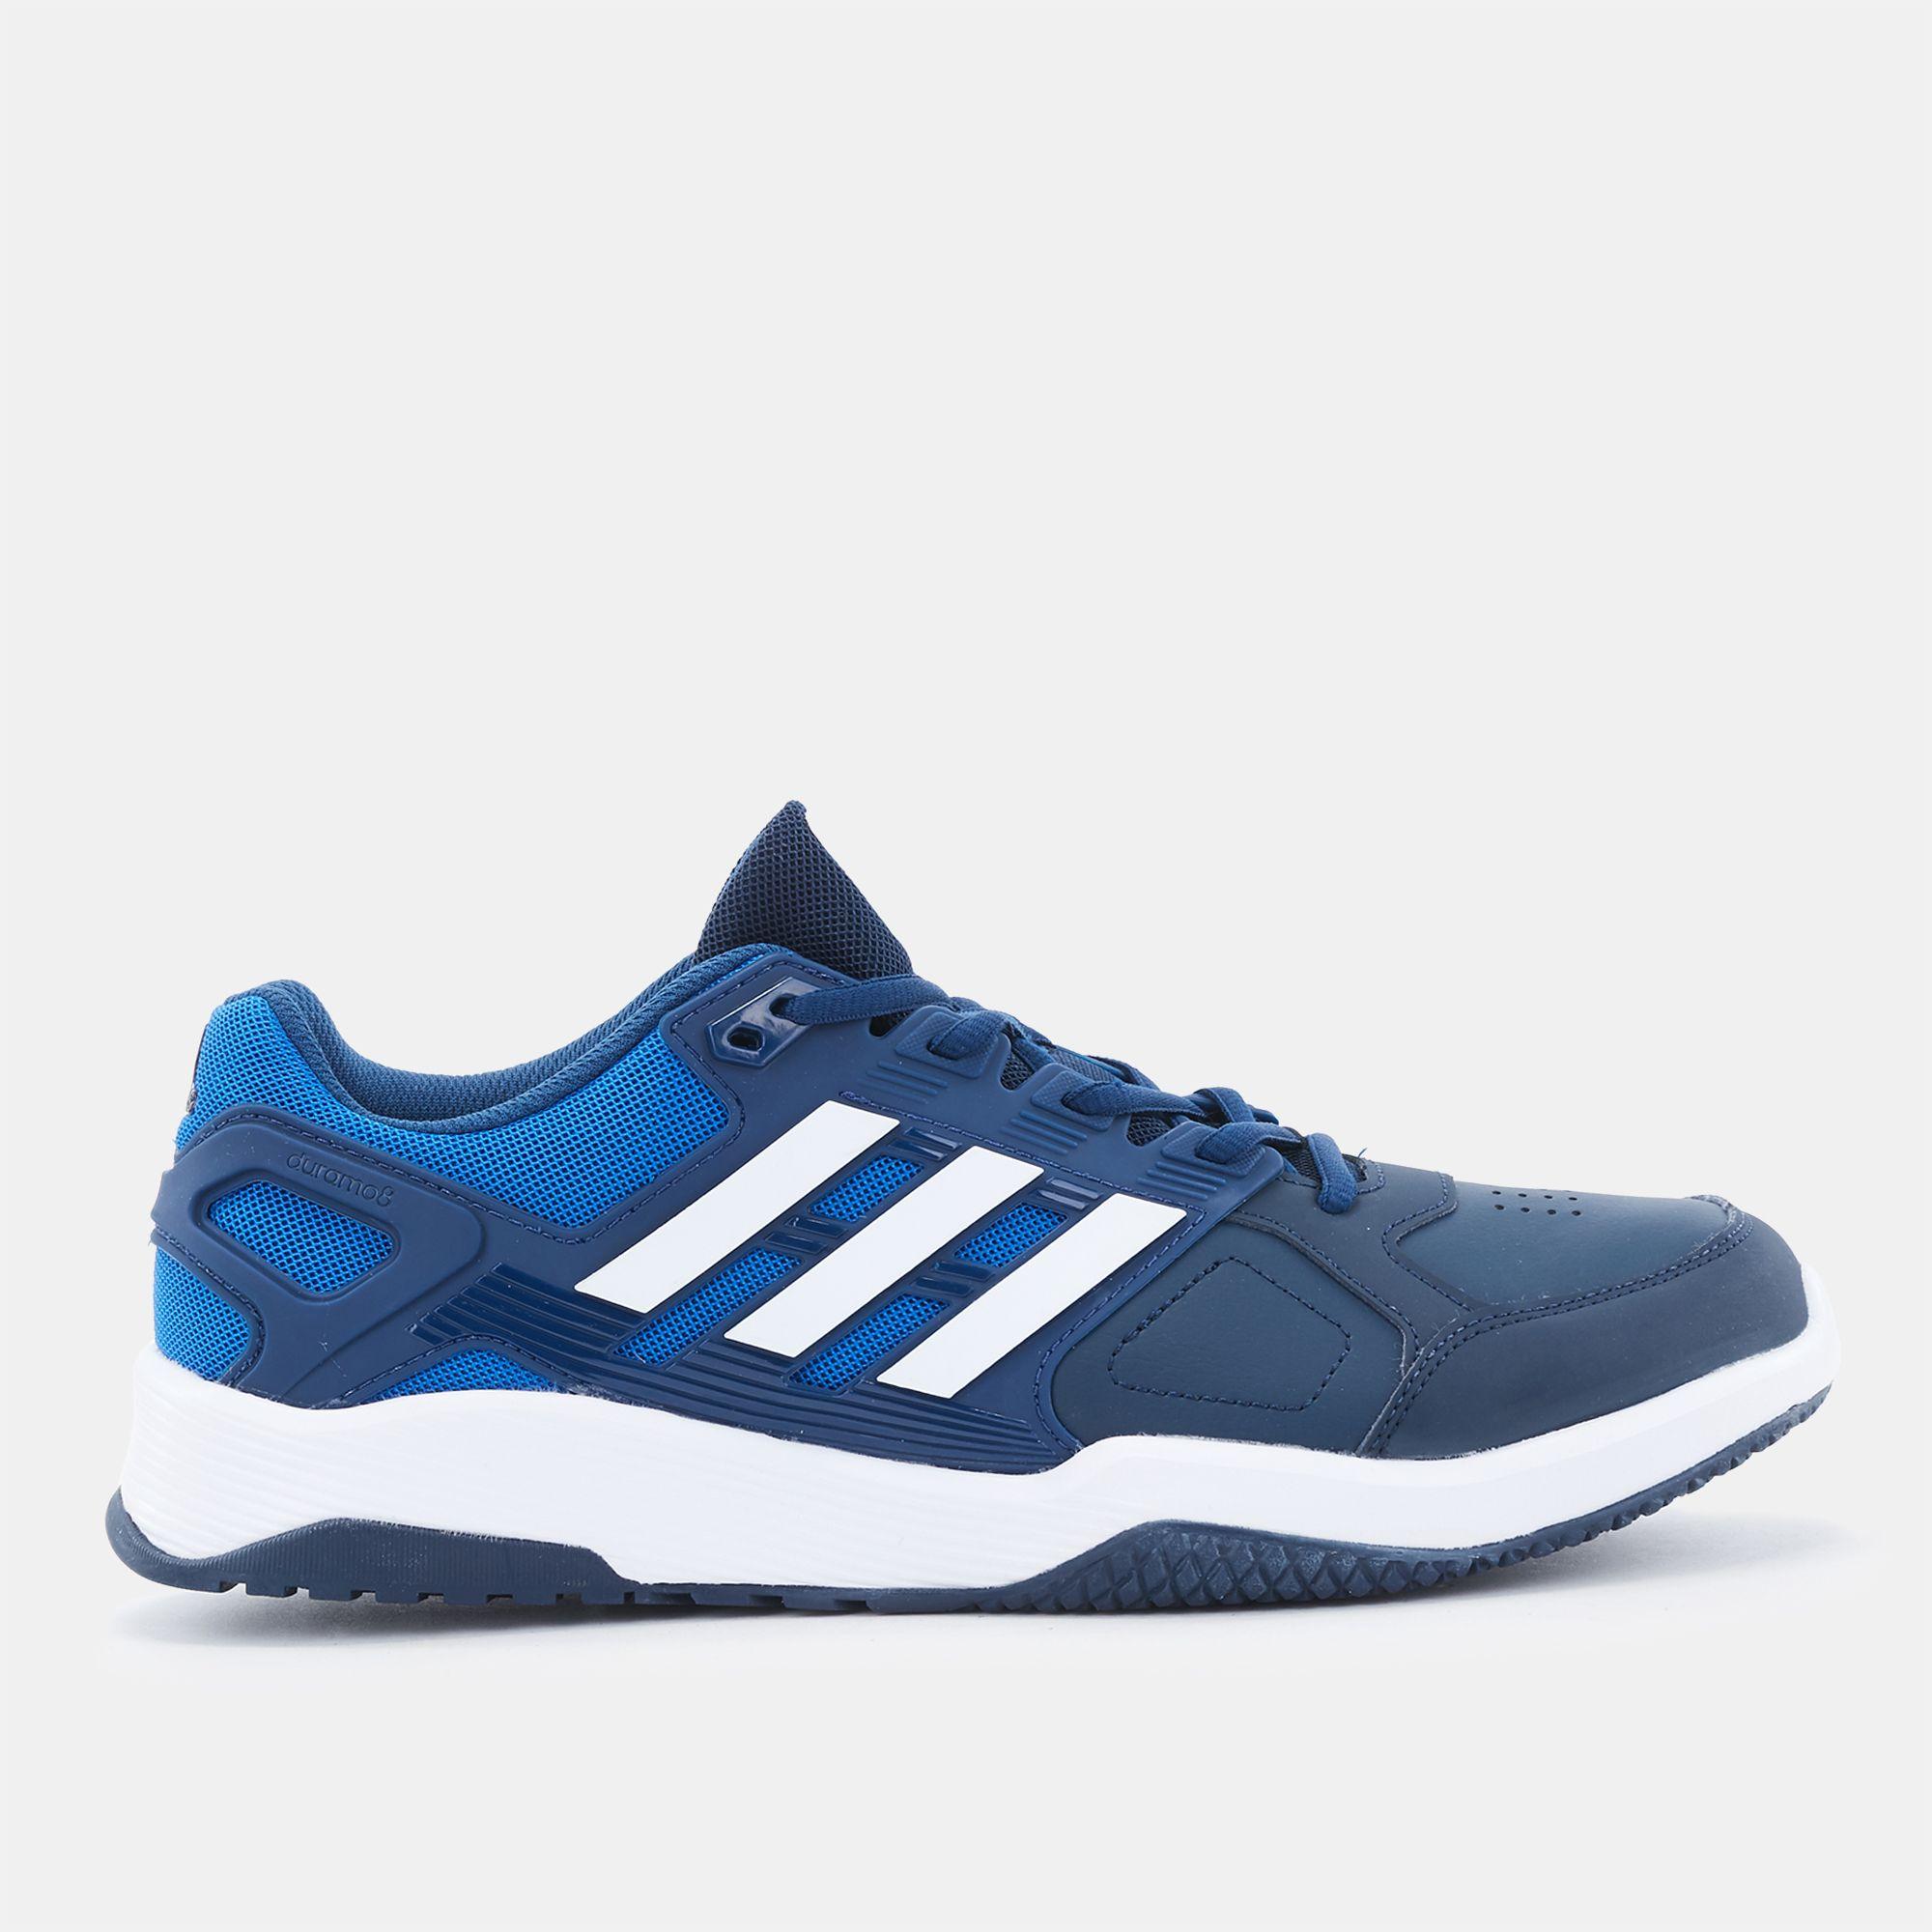 92cedf6a1 Shop Blue adidas Duramo 8 Trainer Shoe for Mens by adidas